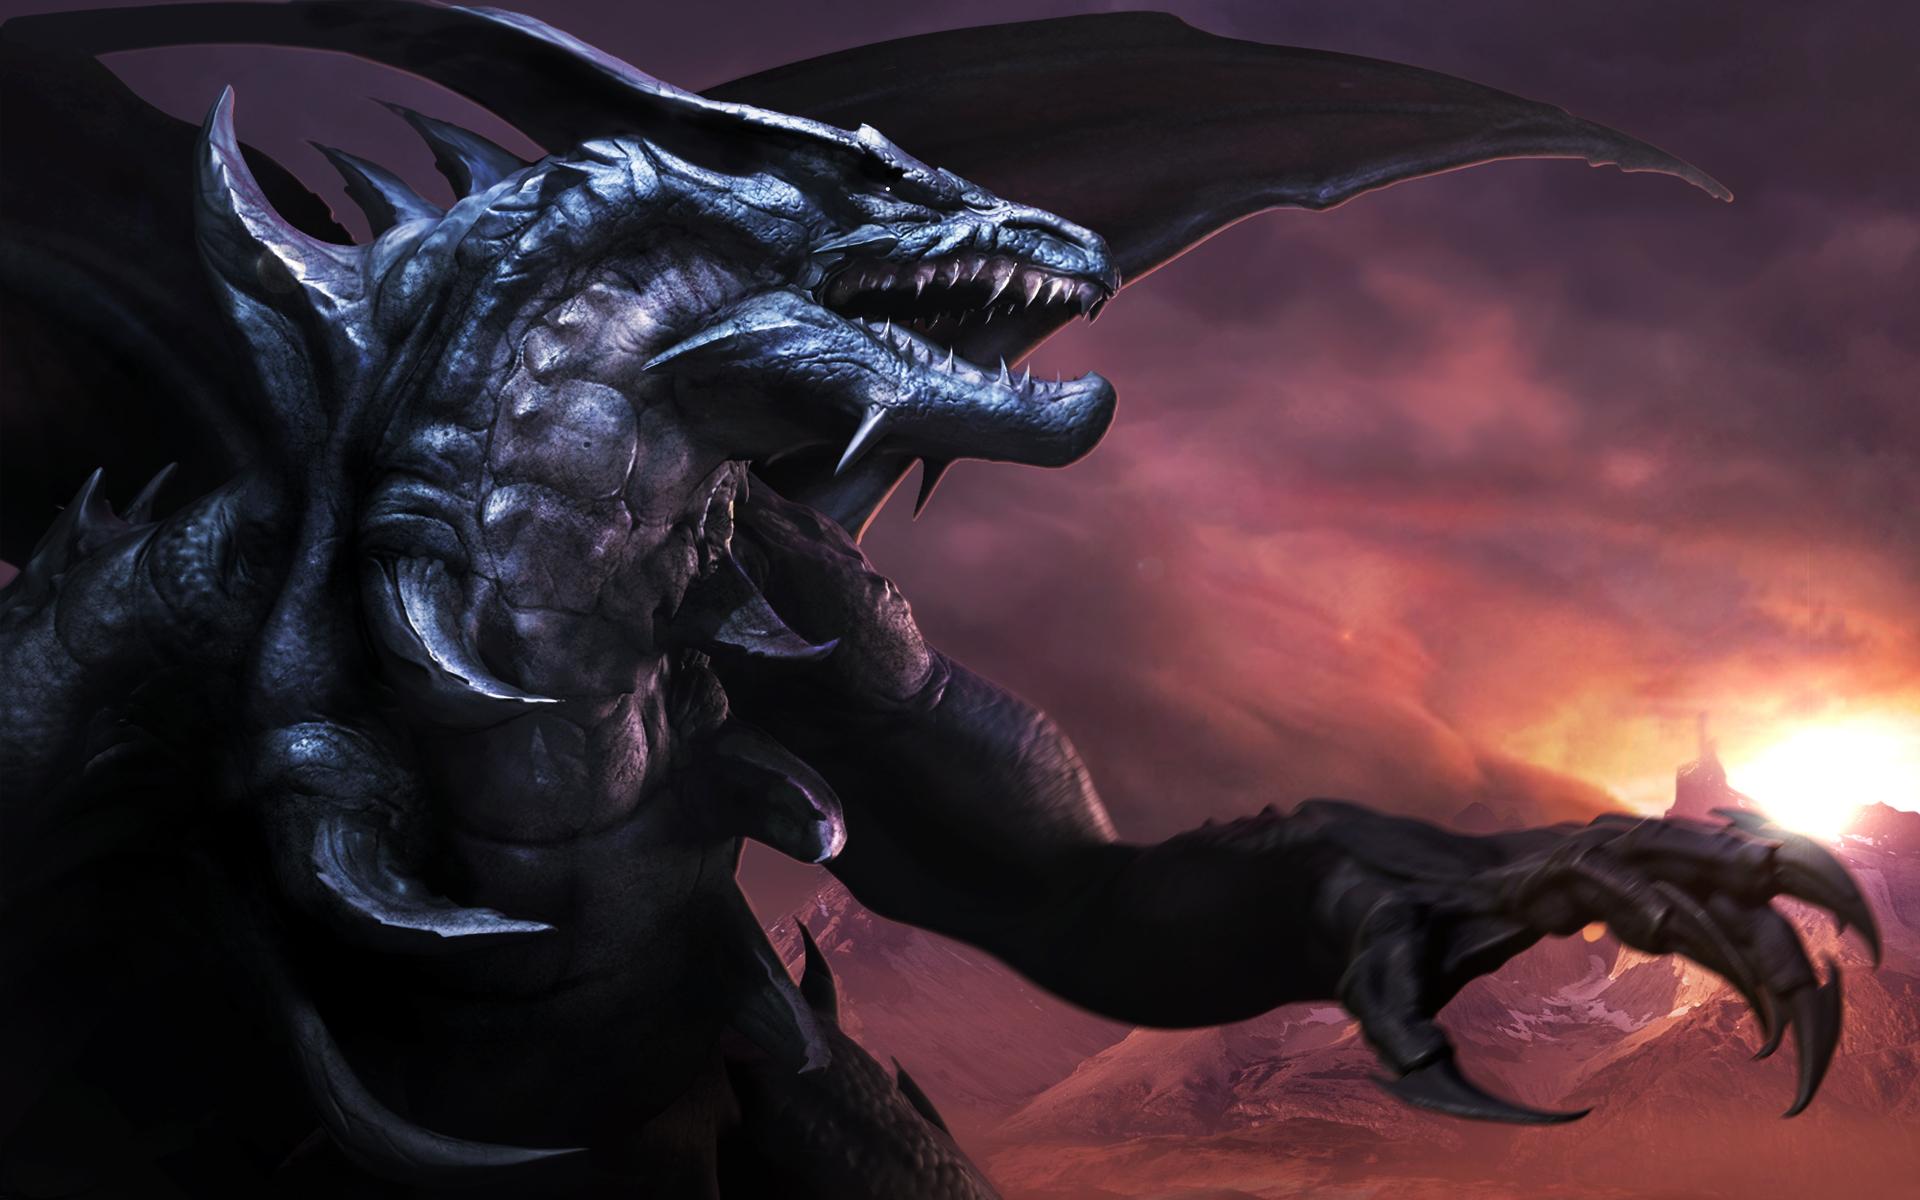 Great Wallpaper High Quality Dragon - Dragon-Image-Wallpapers-018  Snapshot_586091.jpg